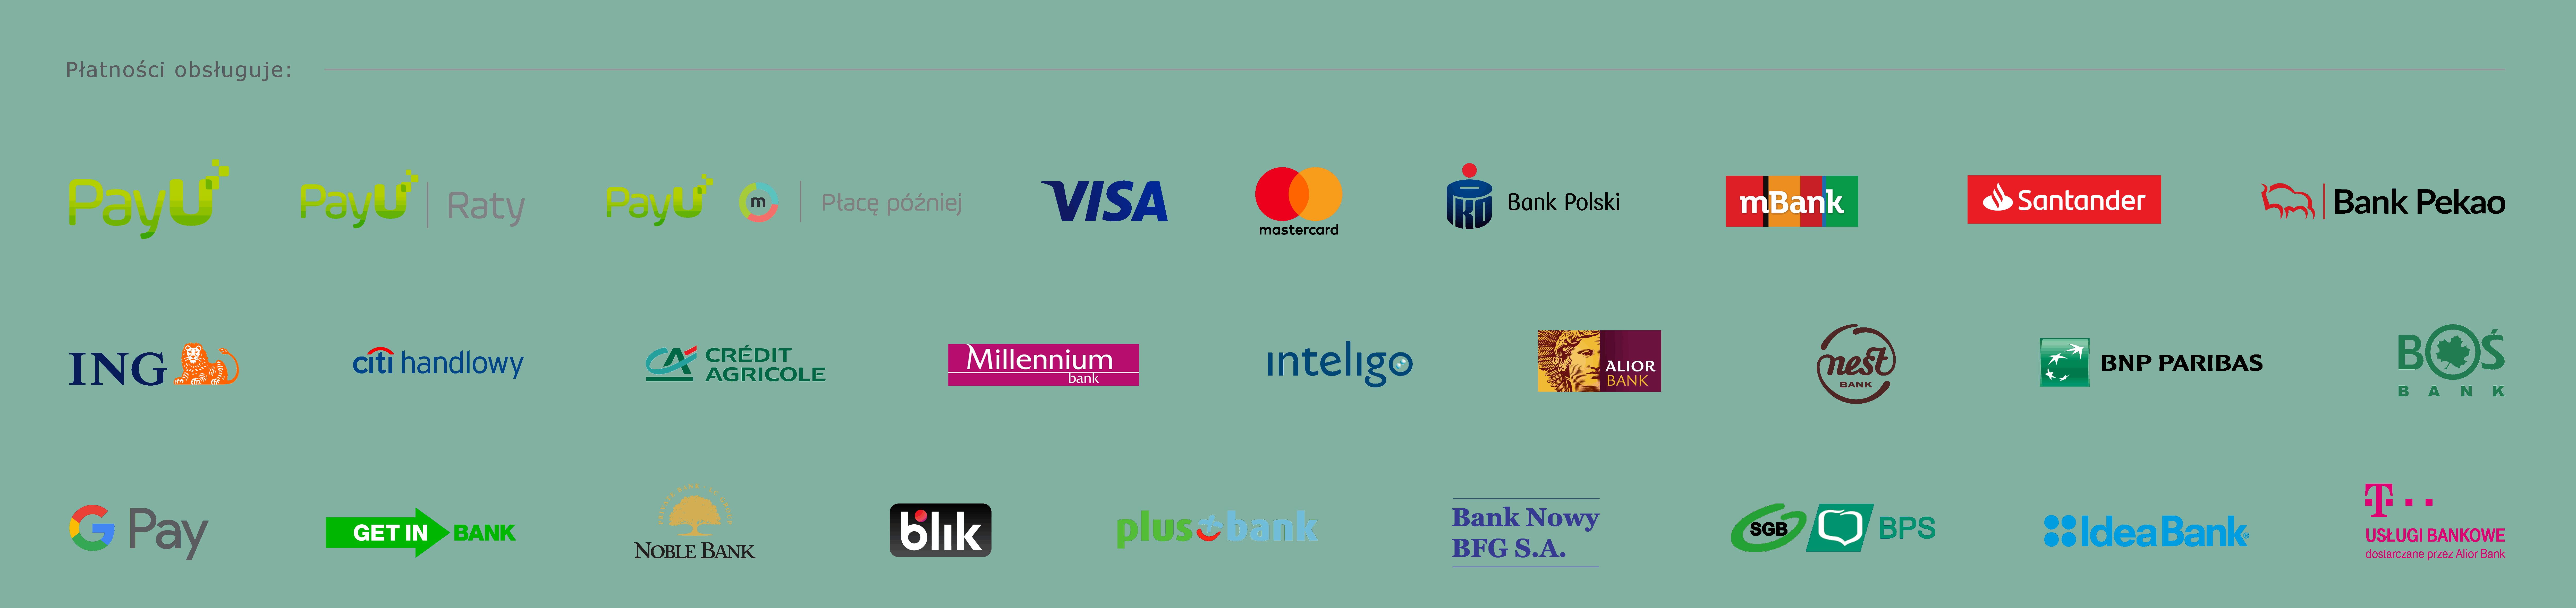 pasek banki karty raty odroczona platnosc gpay e1581603244993 - Regulamin